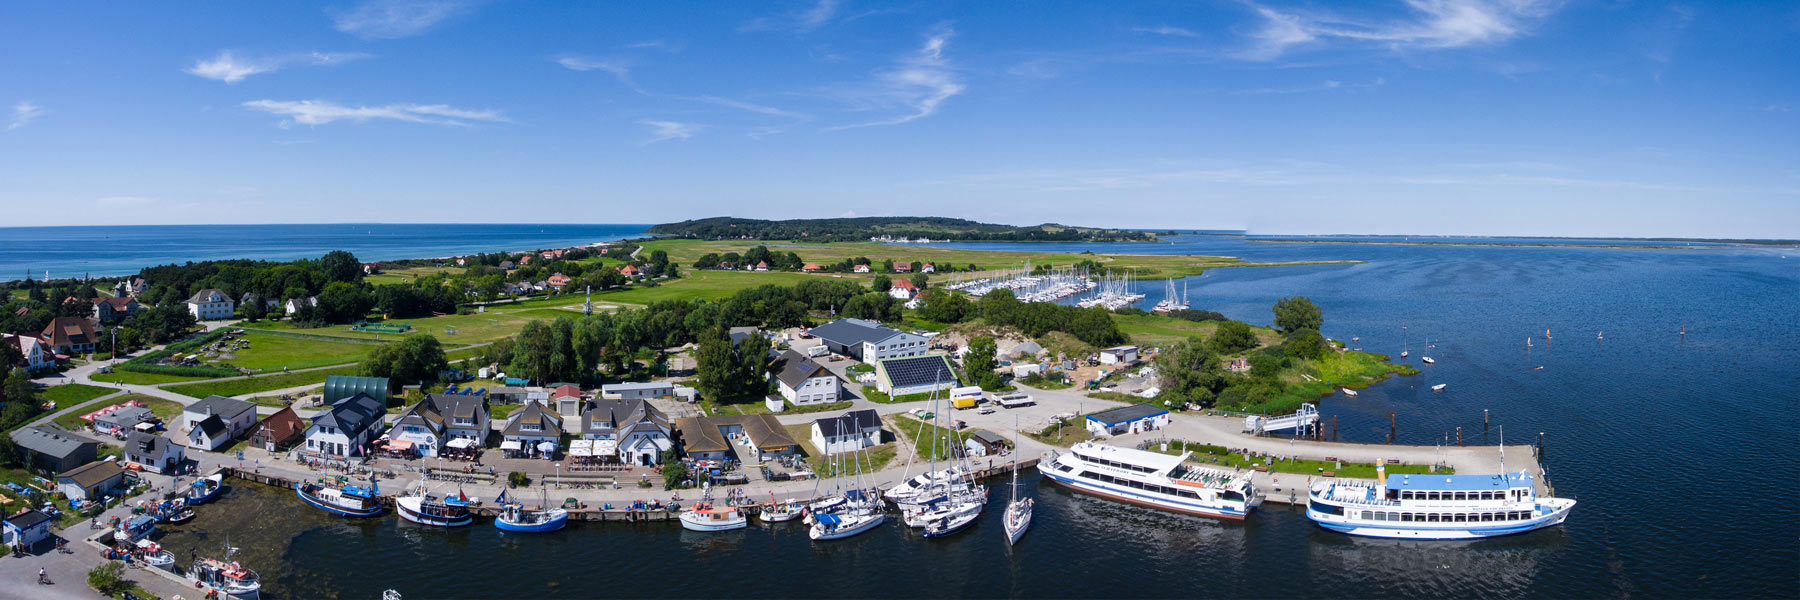 Vitte - Insel Hiddensee